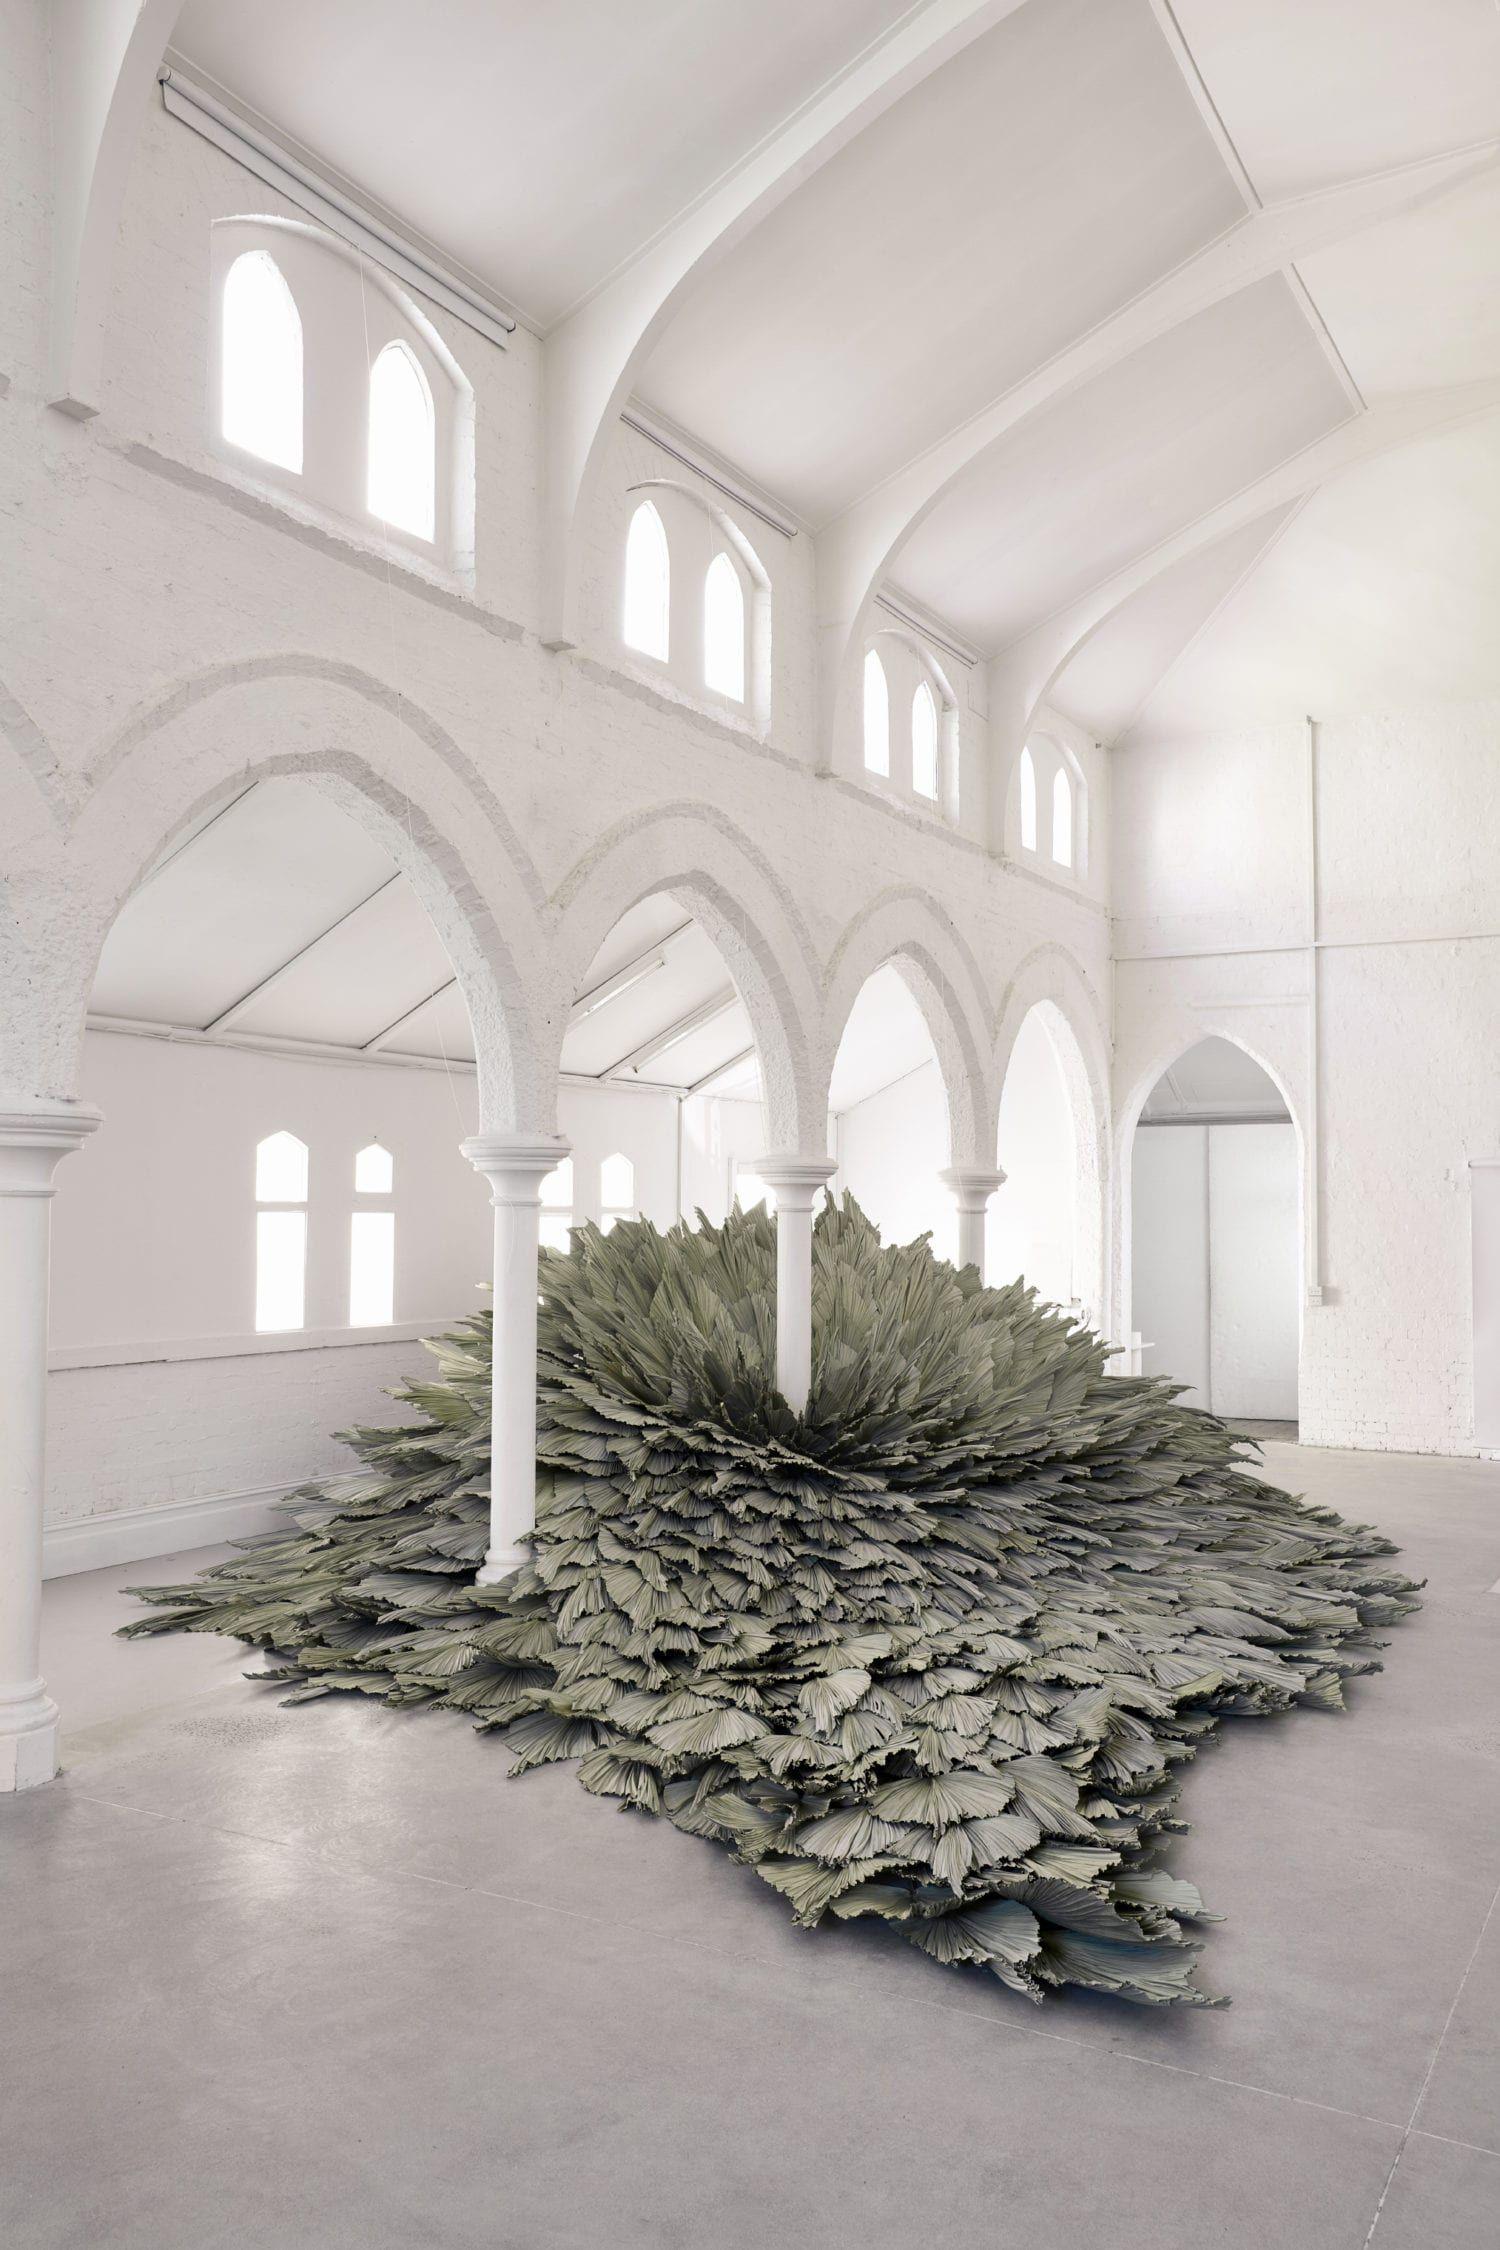 Proximity Botanical Installation by Wona Bae & Charlie Lawler of Loose Leaf.